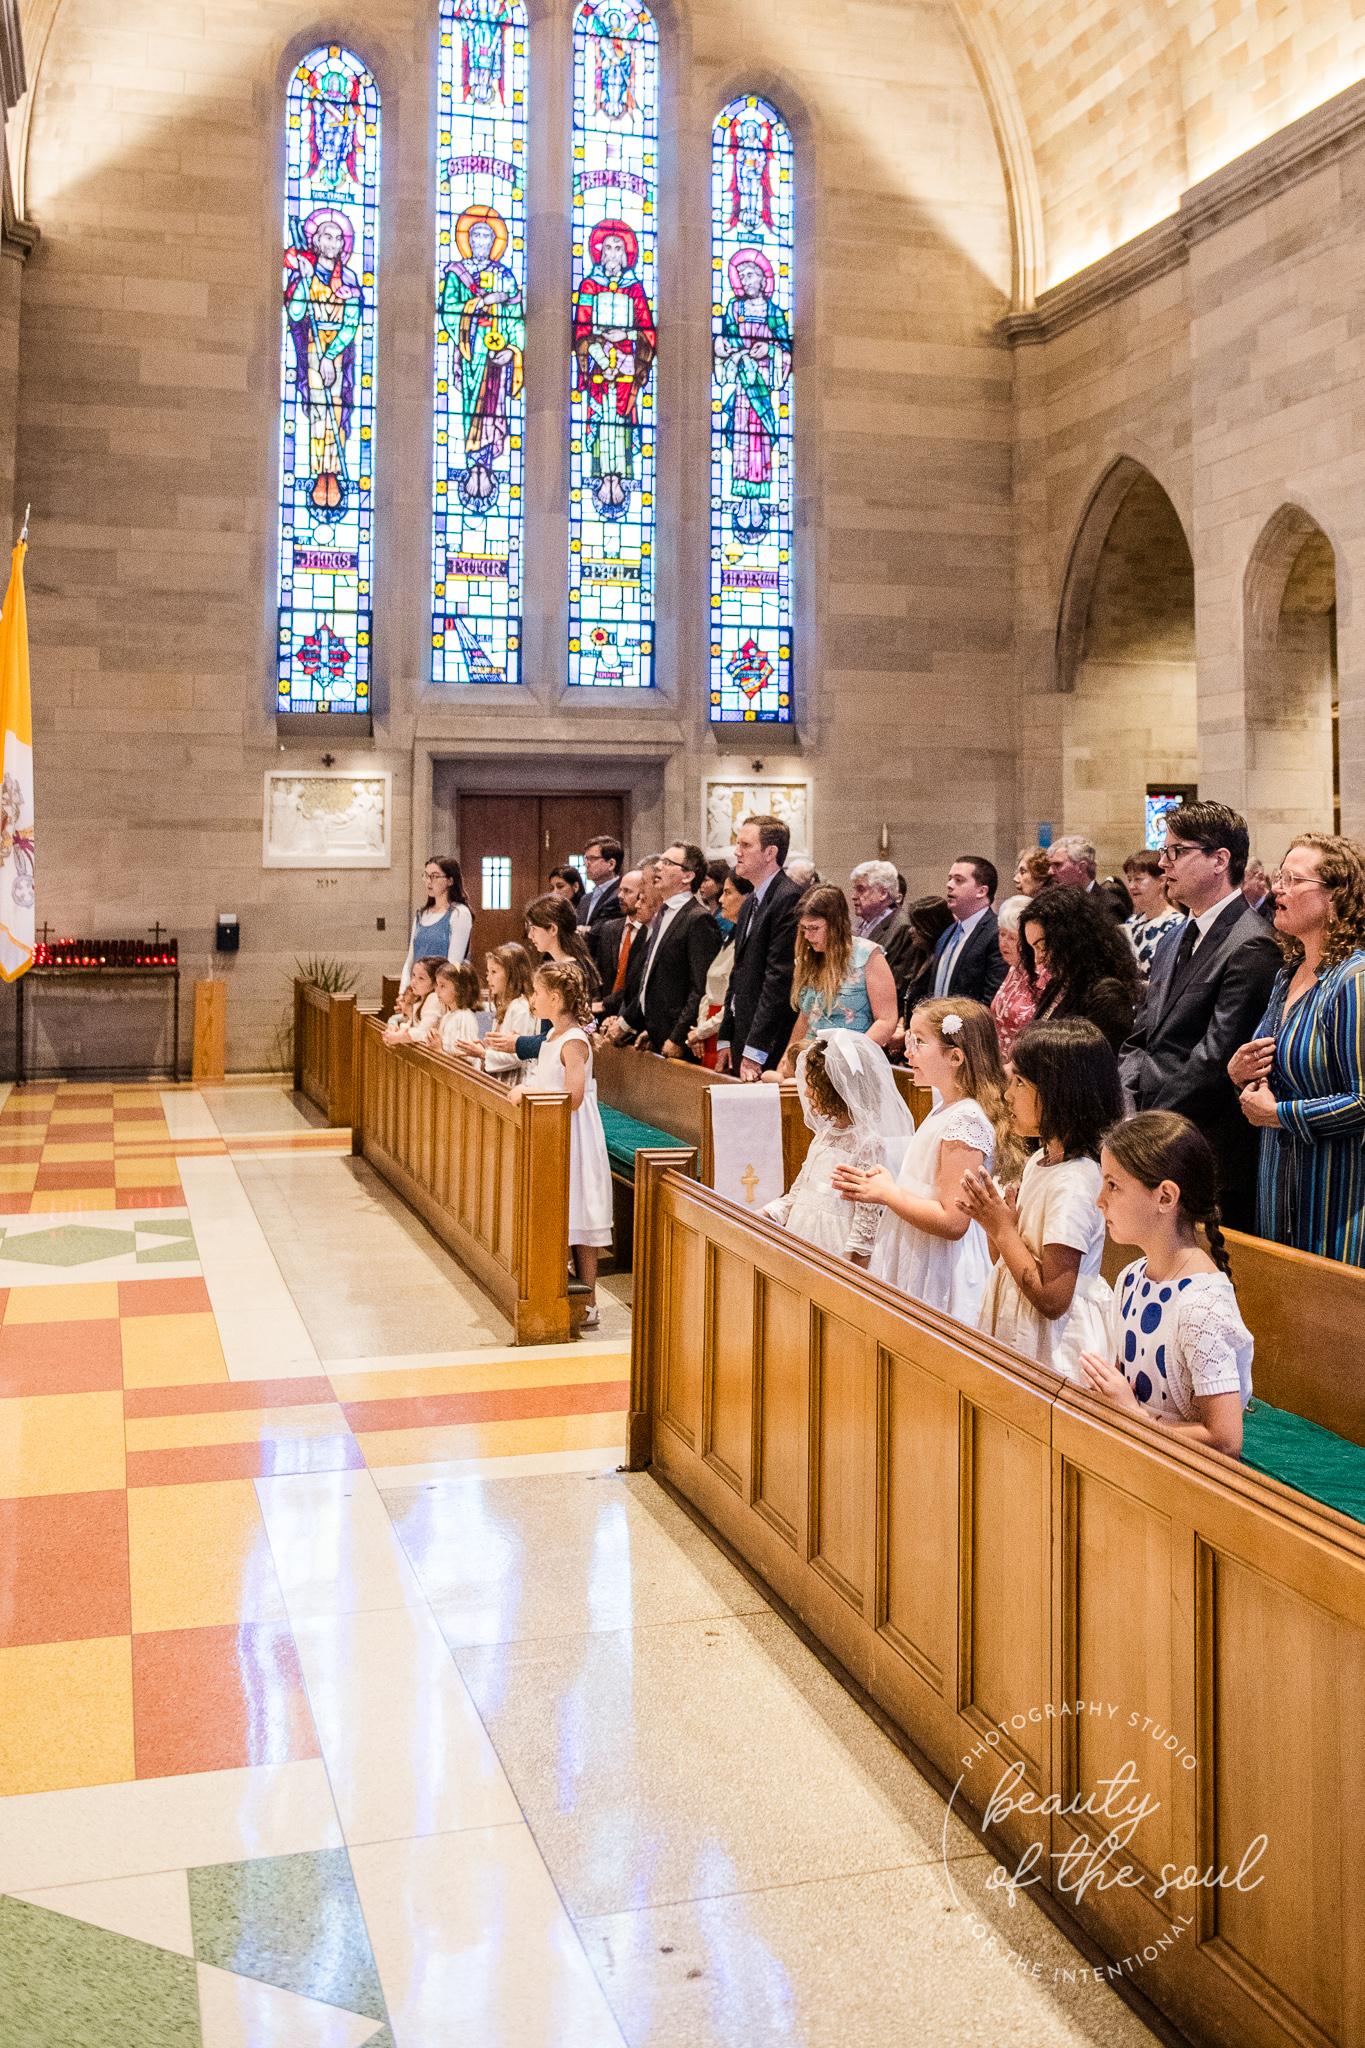 washington-dc-st-ann-catholic-church-first-holy-communion-beauty-of-the-soul-studio-may-2019-14.jpg